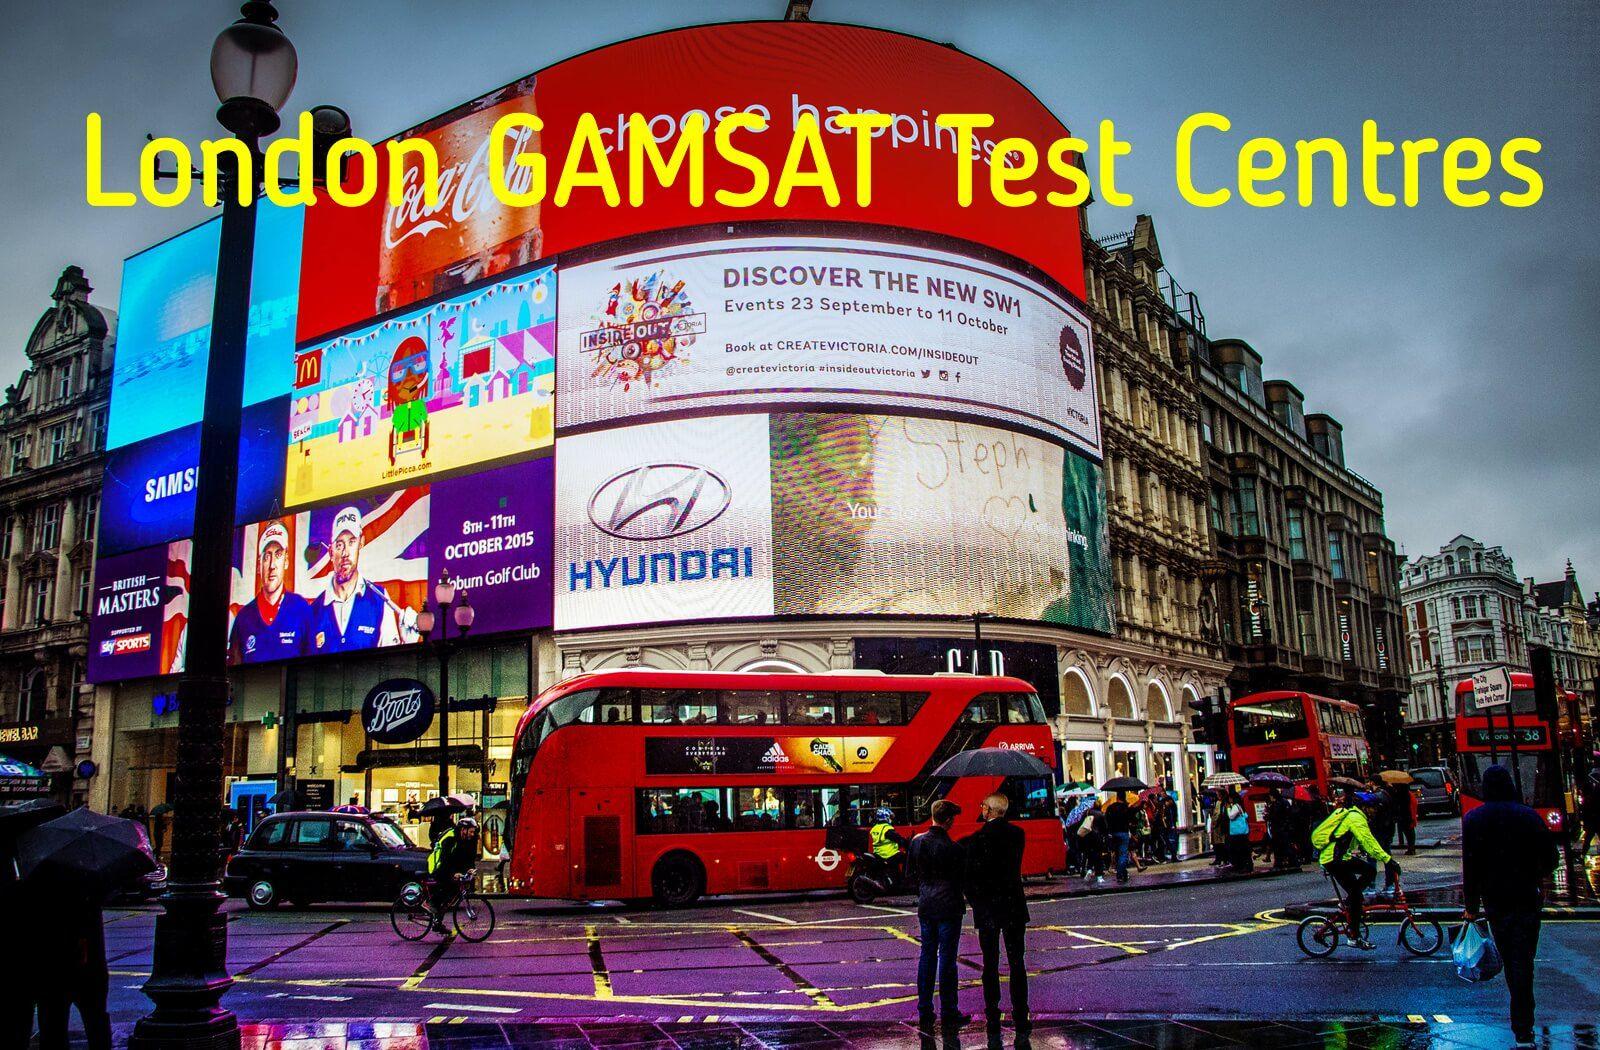 Where is GAMSAT held in London?